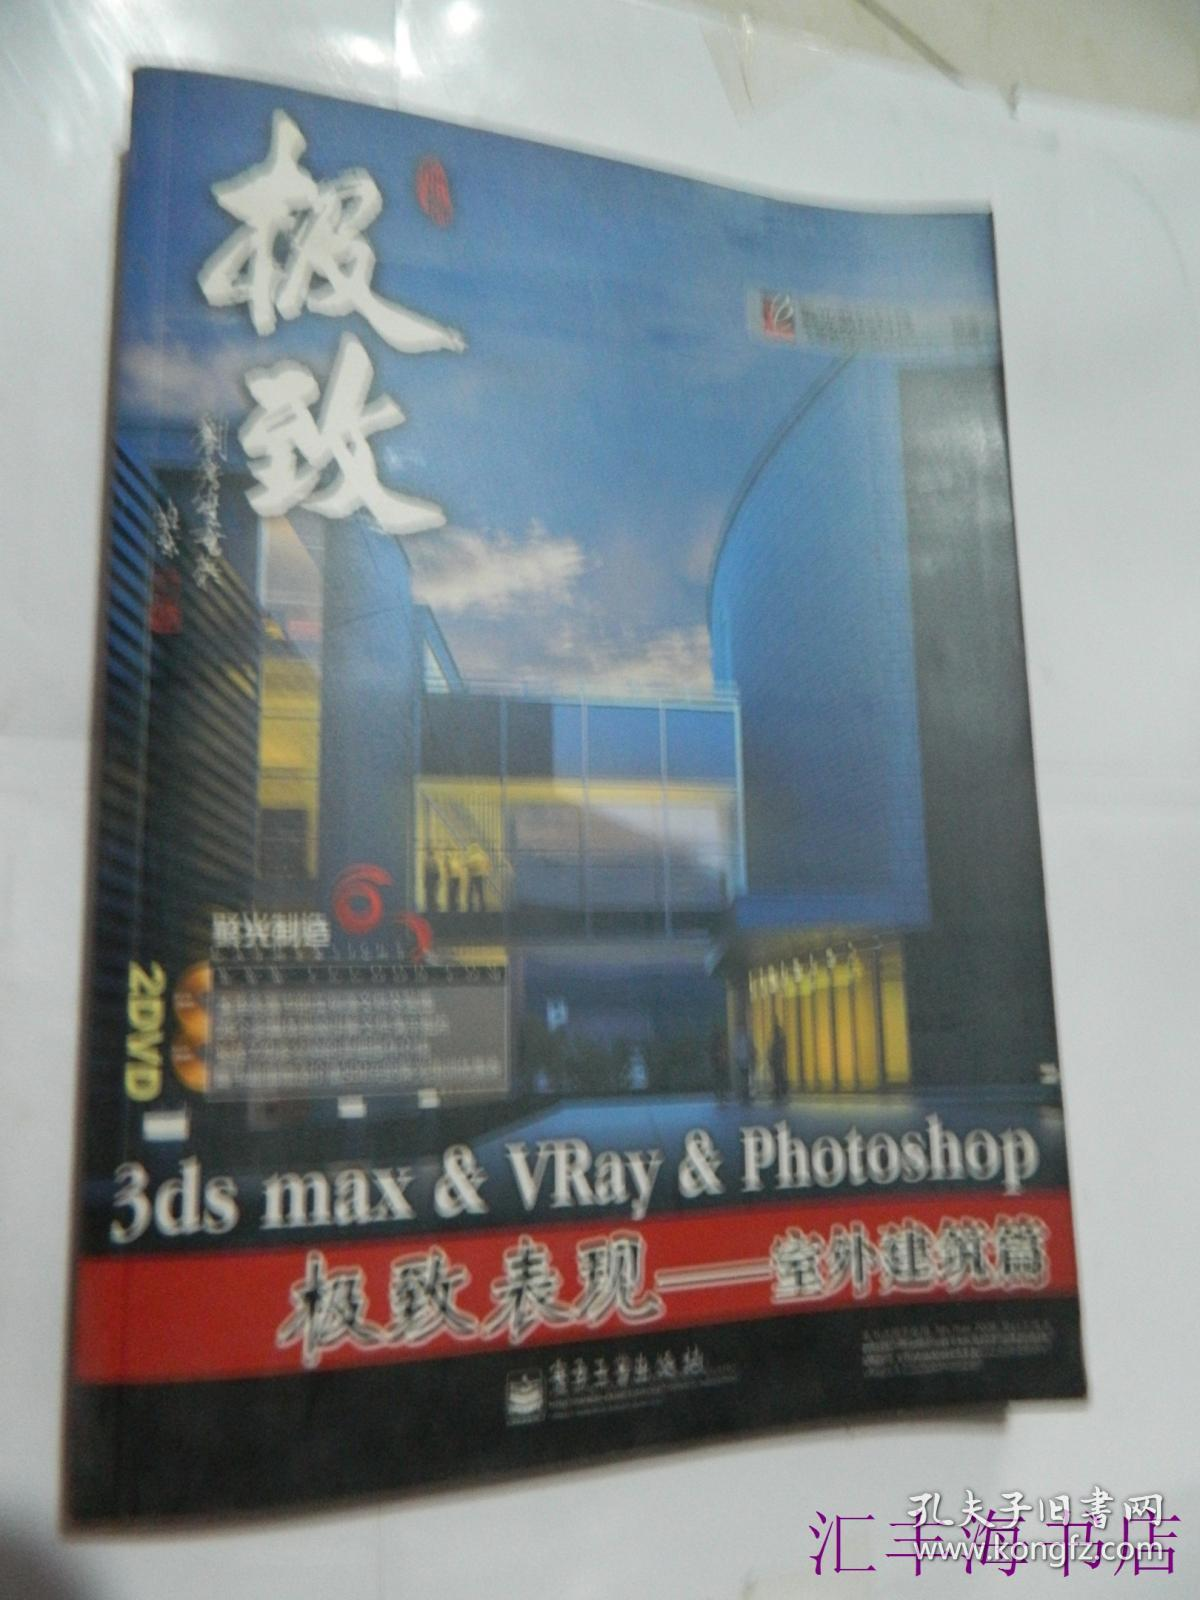 聚光制造·3ds max& Vray&Photoshop 极致表现:室外建筑篇】【无盘】